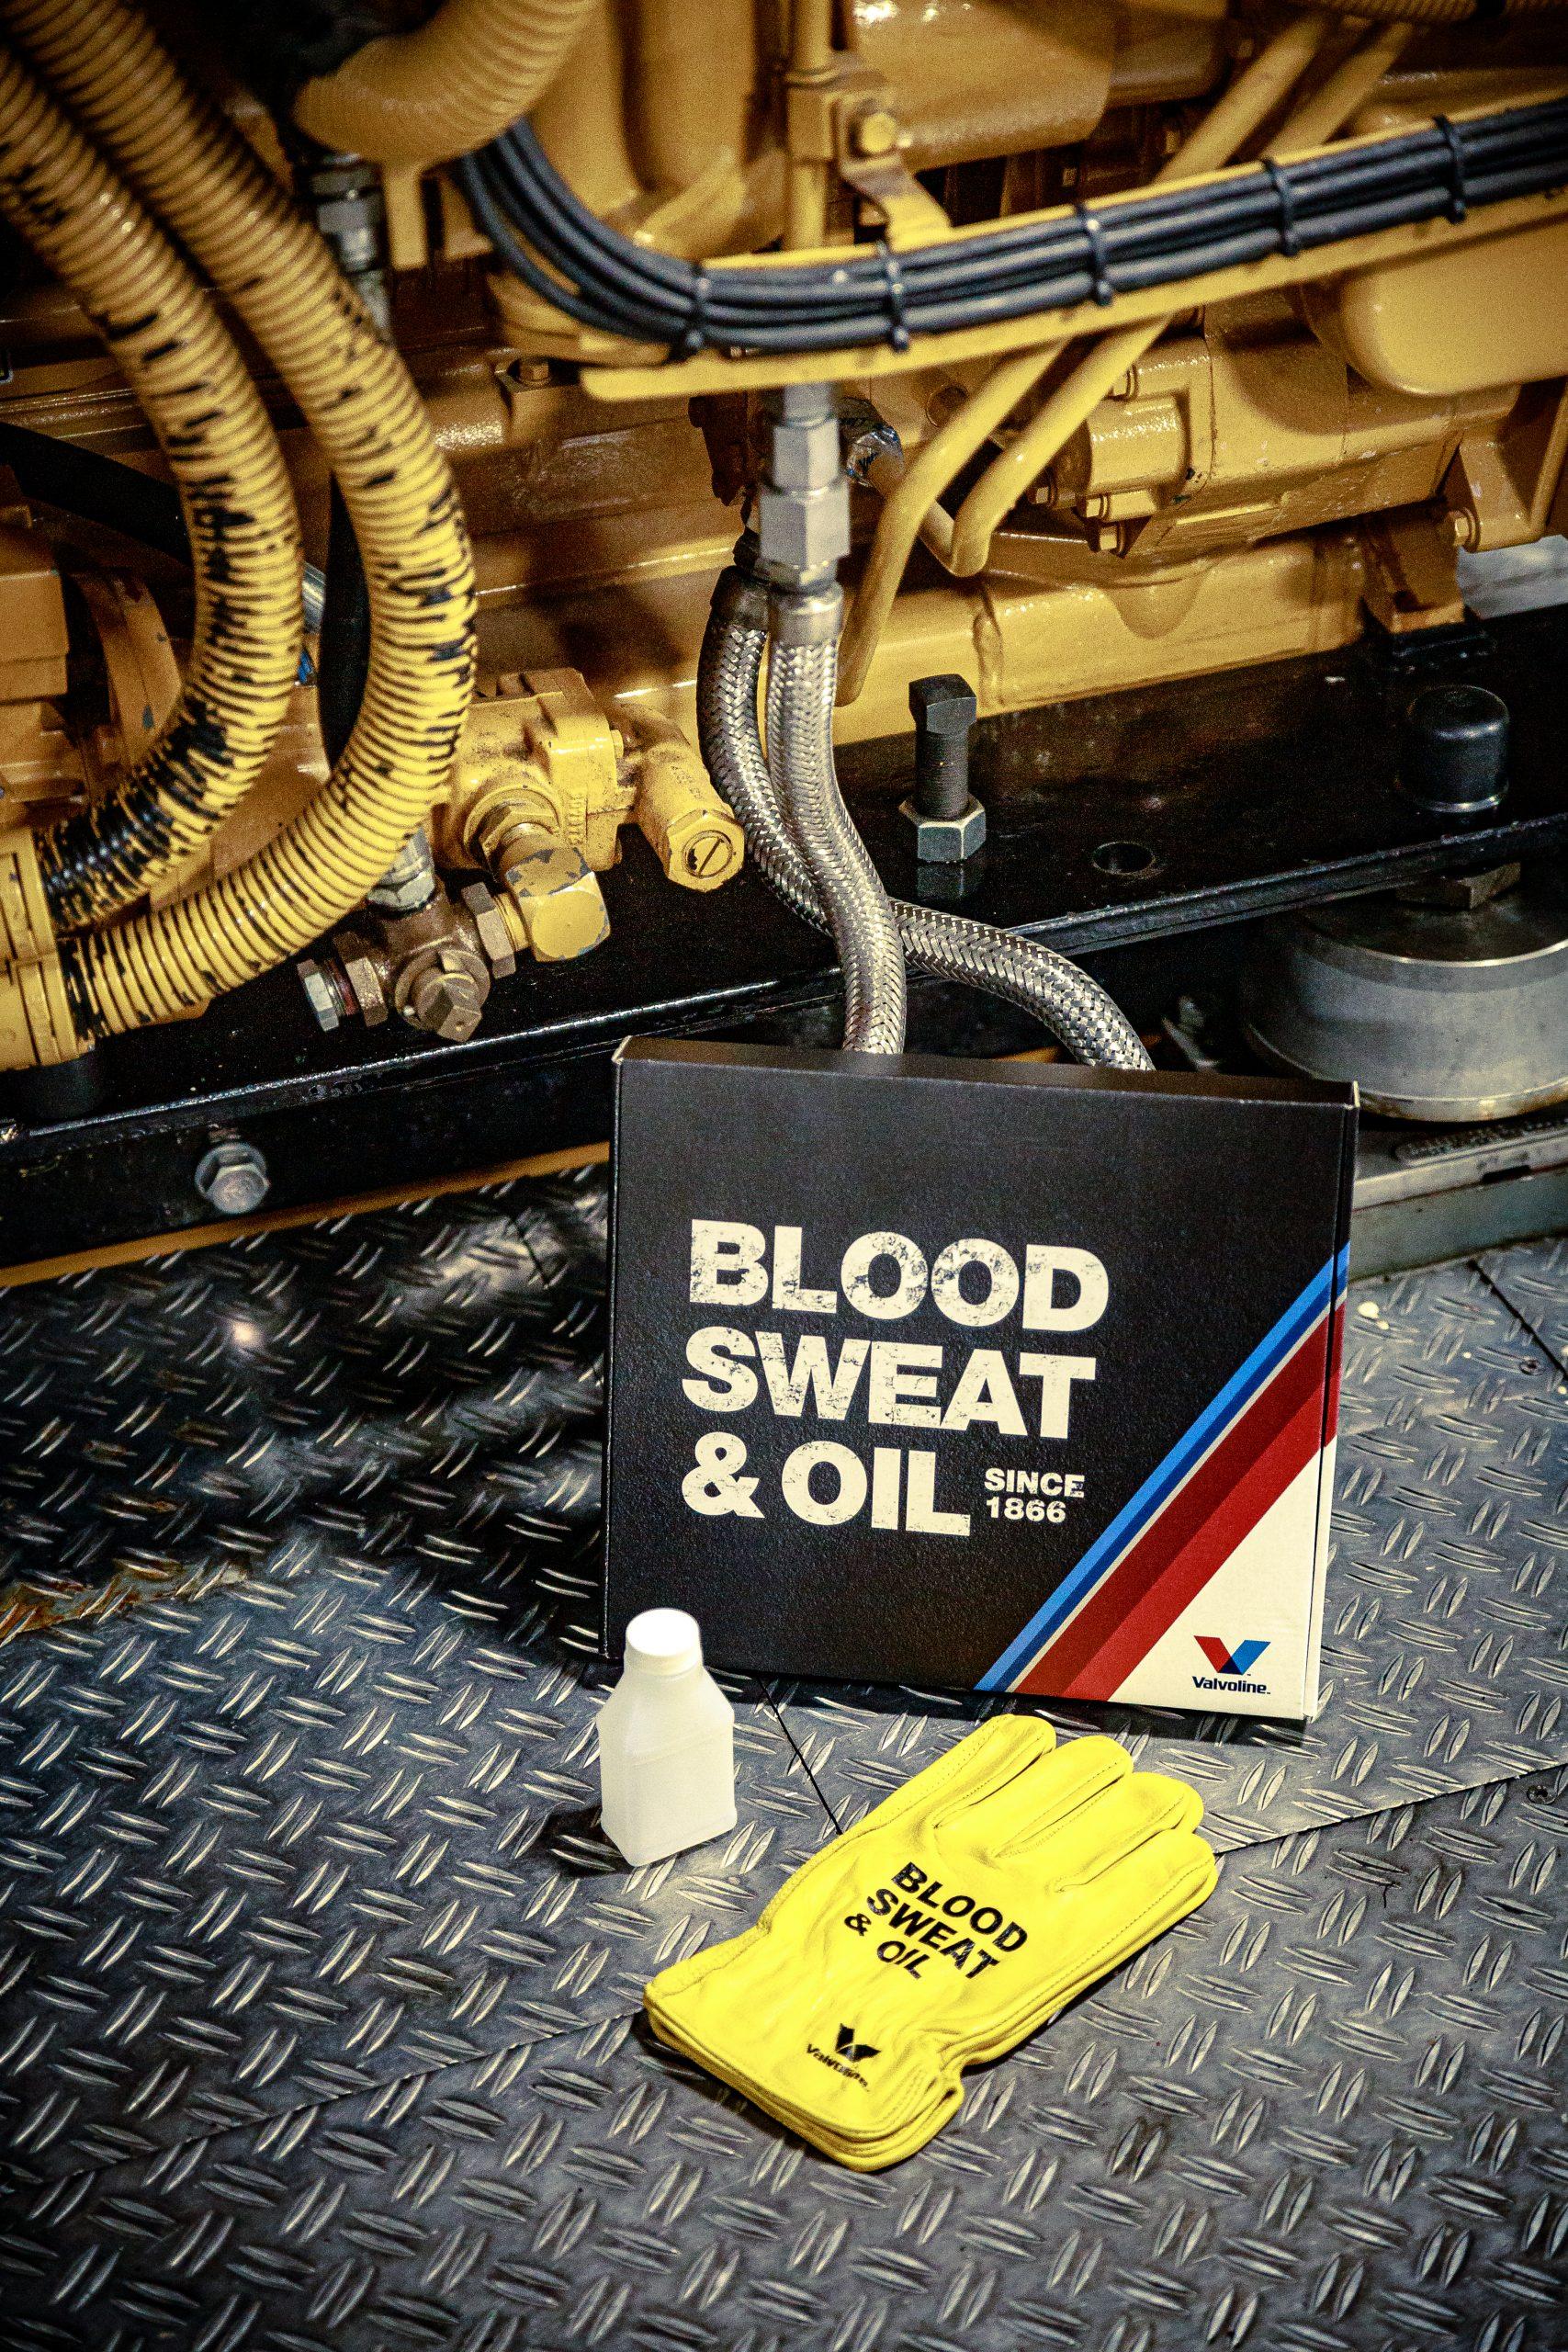 valvoline blood sweat and oil